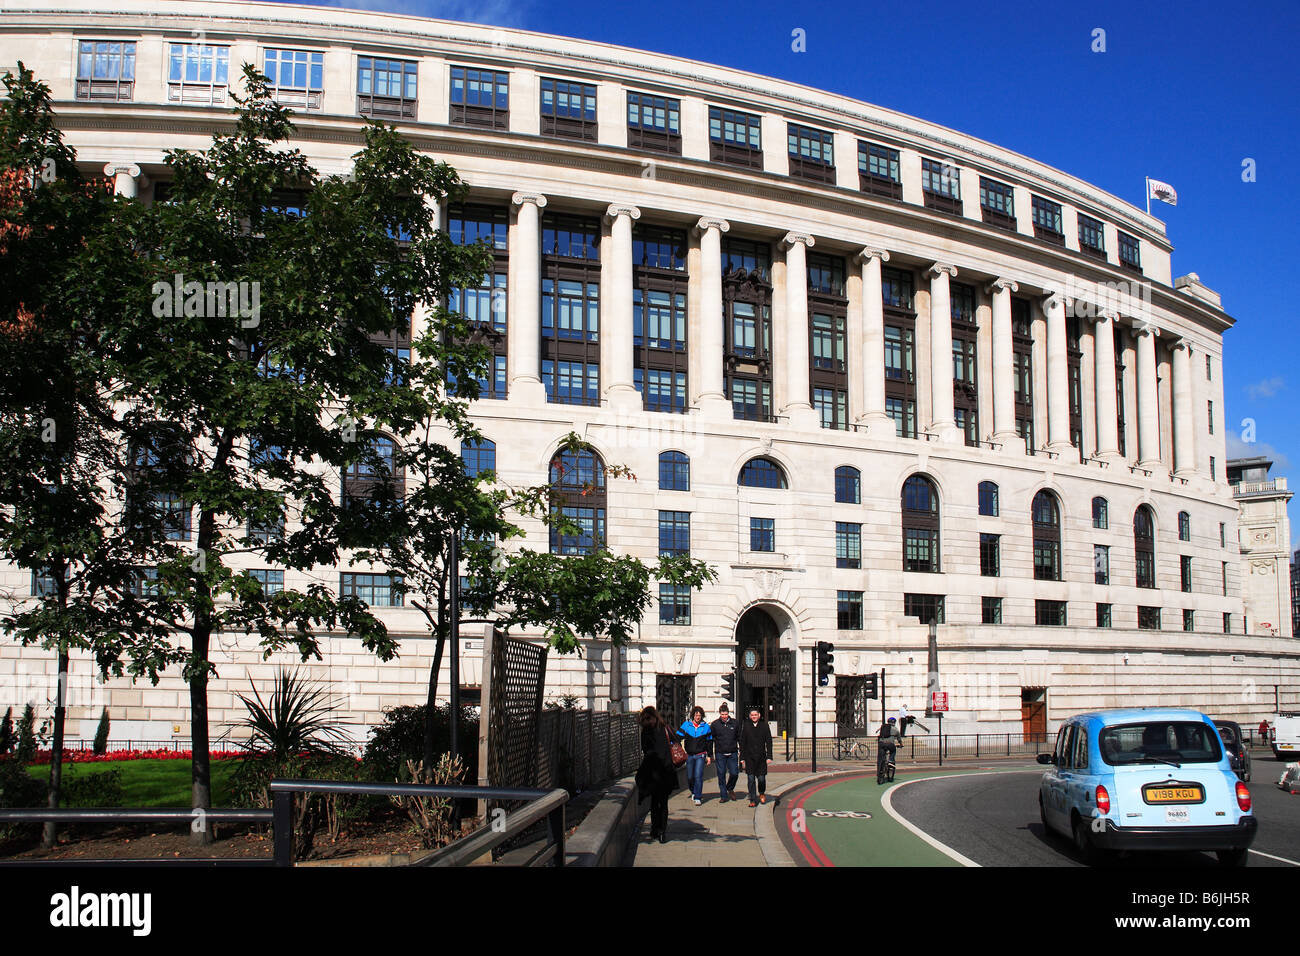 Unilever Office building Embankment City of London England - Stock Image